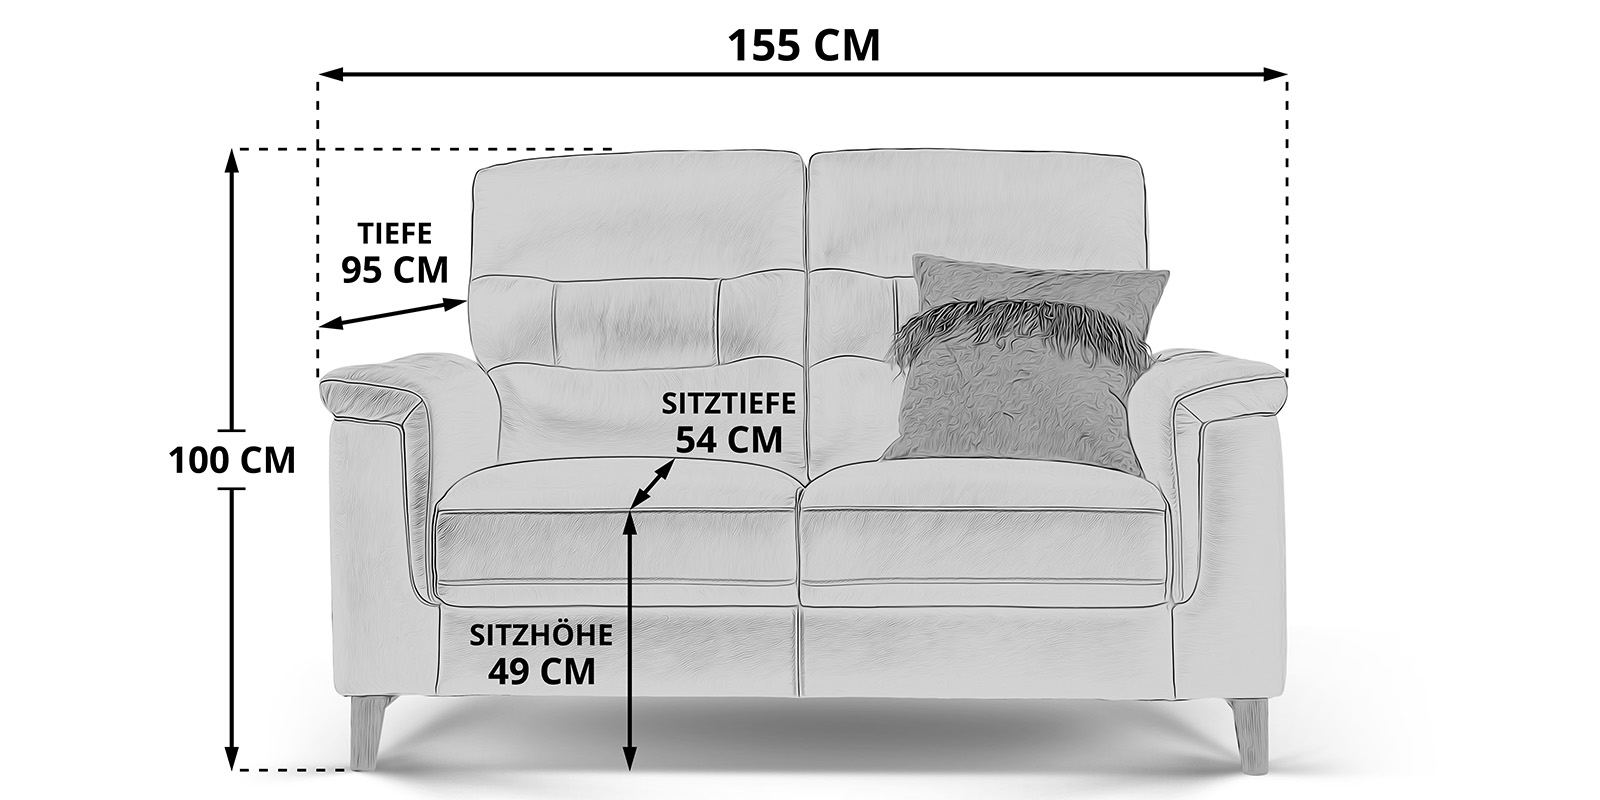 Full Size of Ecksofa Mit Verstellbarer Sitztiefe Sofa Elektrisch Big 2 Sitzer Ledersofa Verstellbar Madrid Skizze Indomo Langes Modernes Inhofer Ohne Lehne Canape Sofa Sofa Mit Verstellbarer Sitztiefe